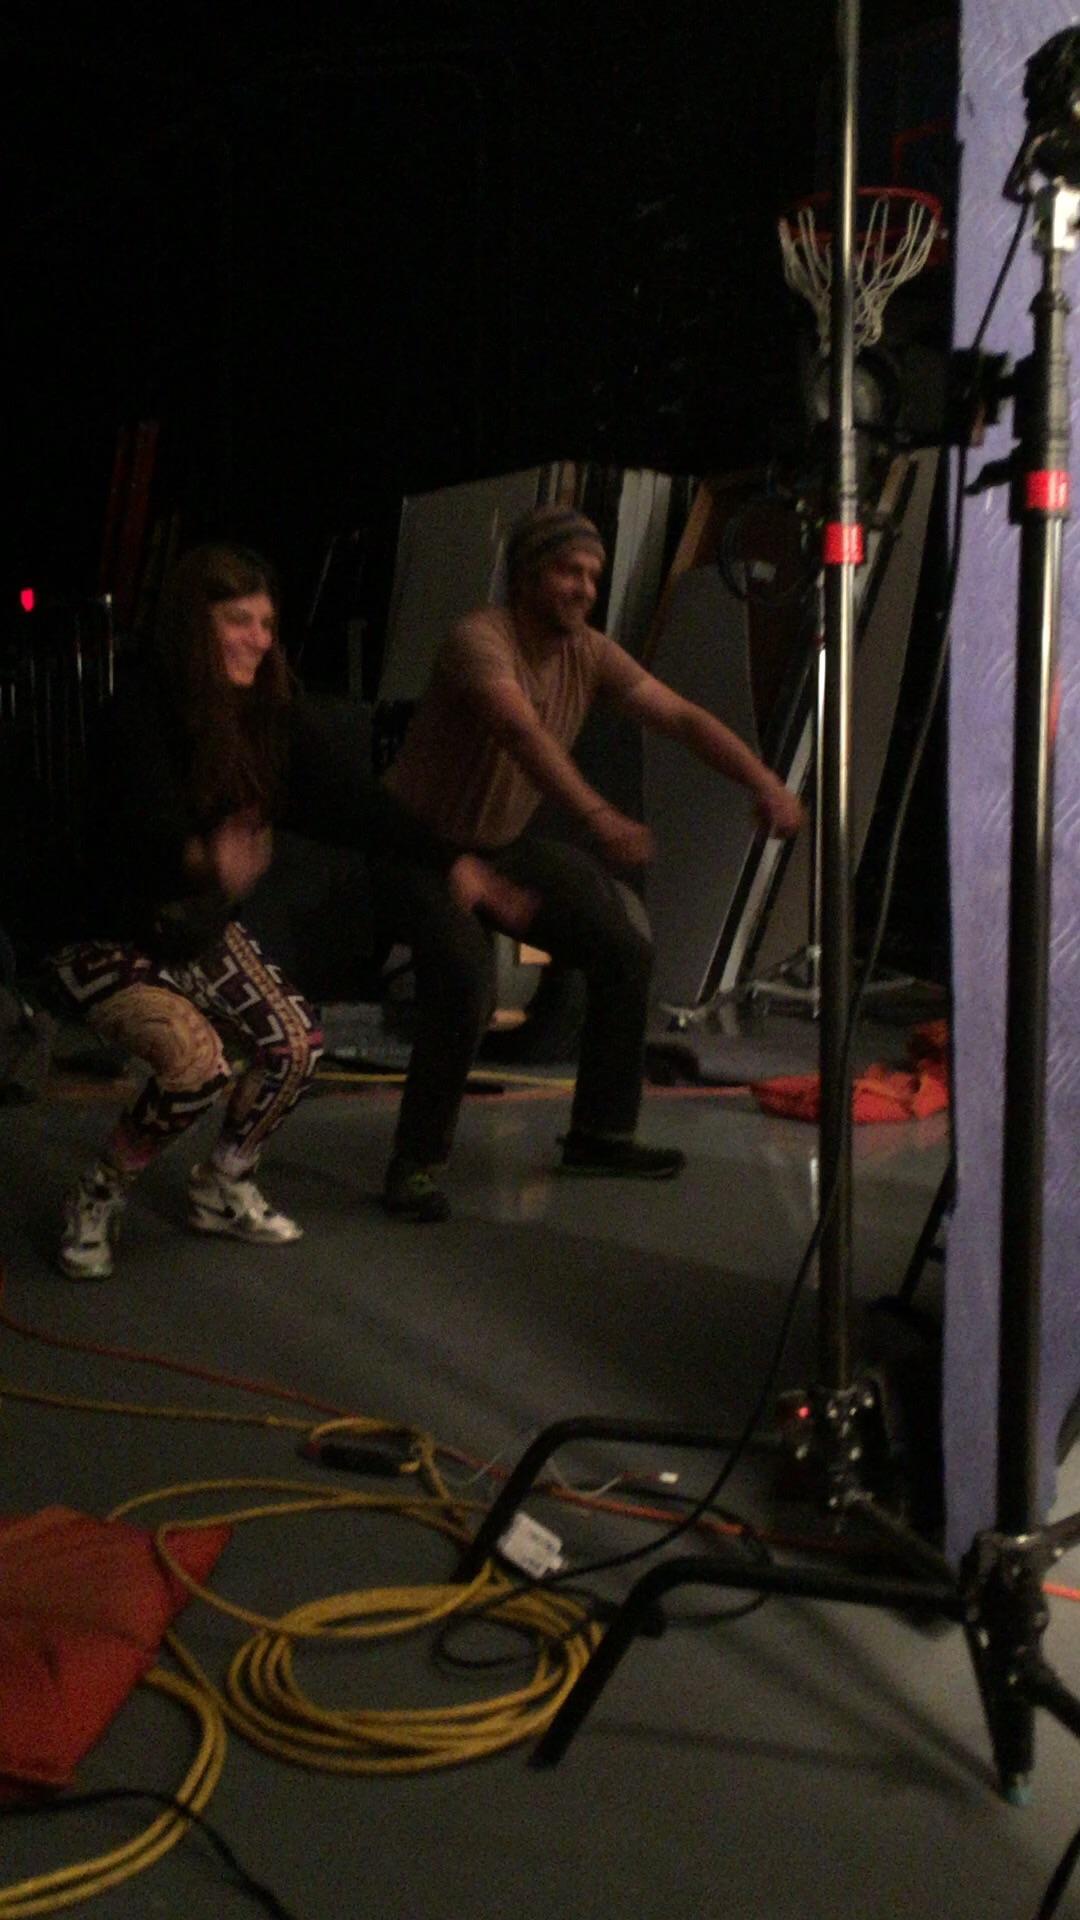 Power squats... Hour 11-12ish